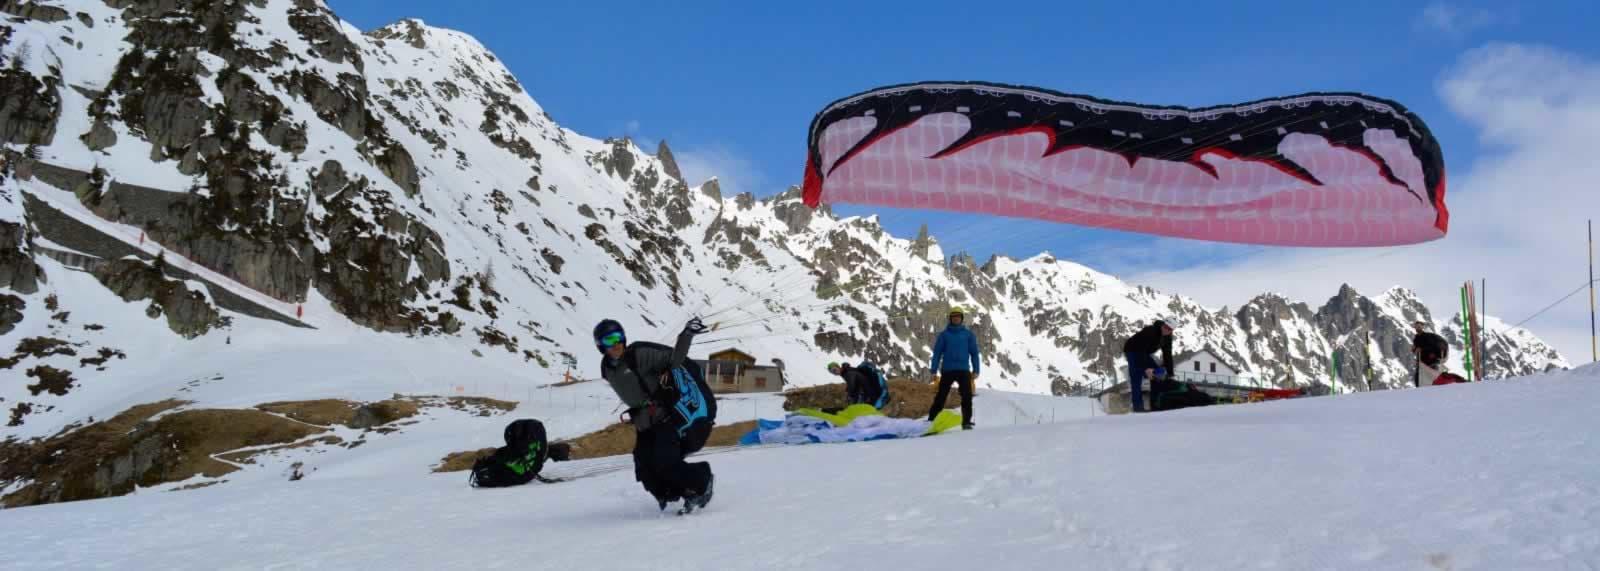 Planpraz Take off in Chamonix - SkySchool